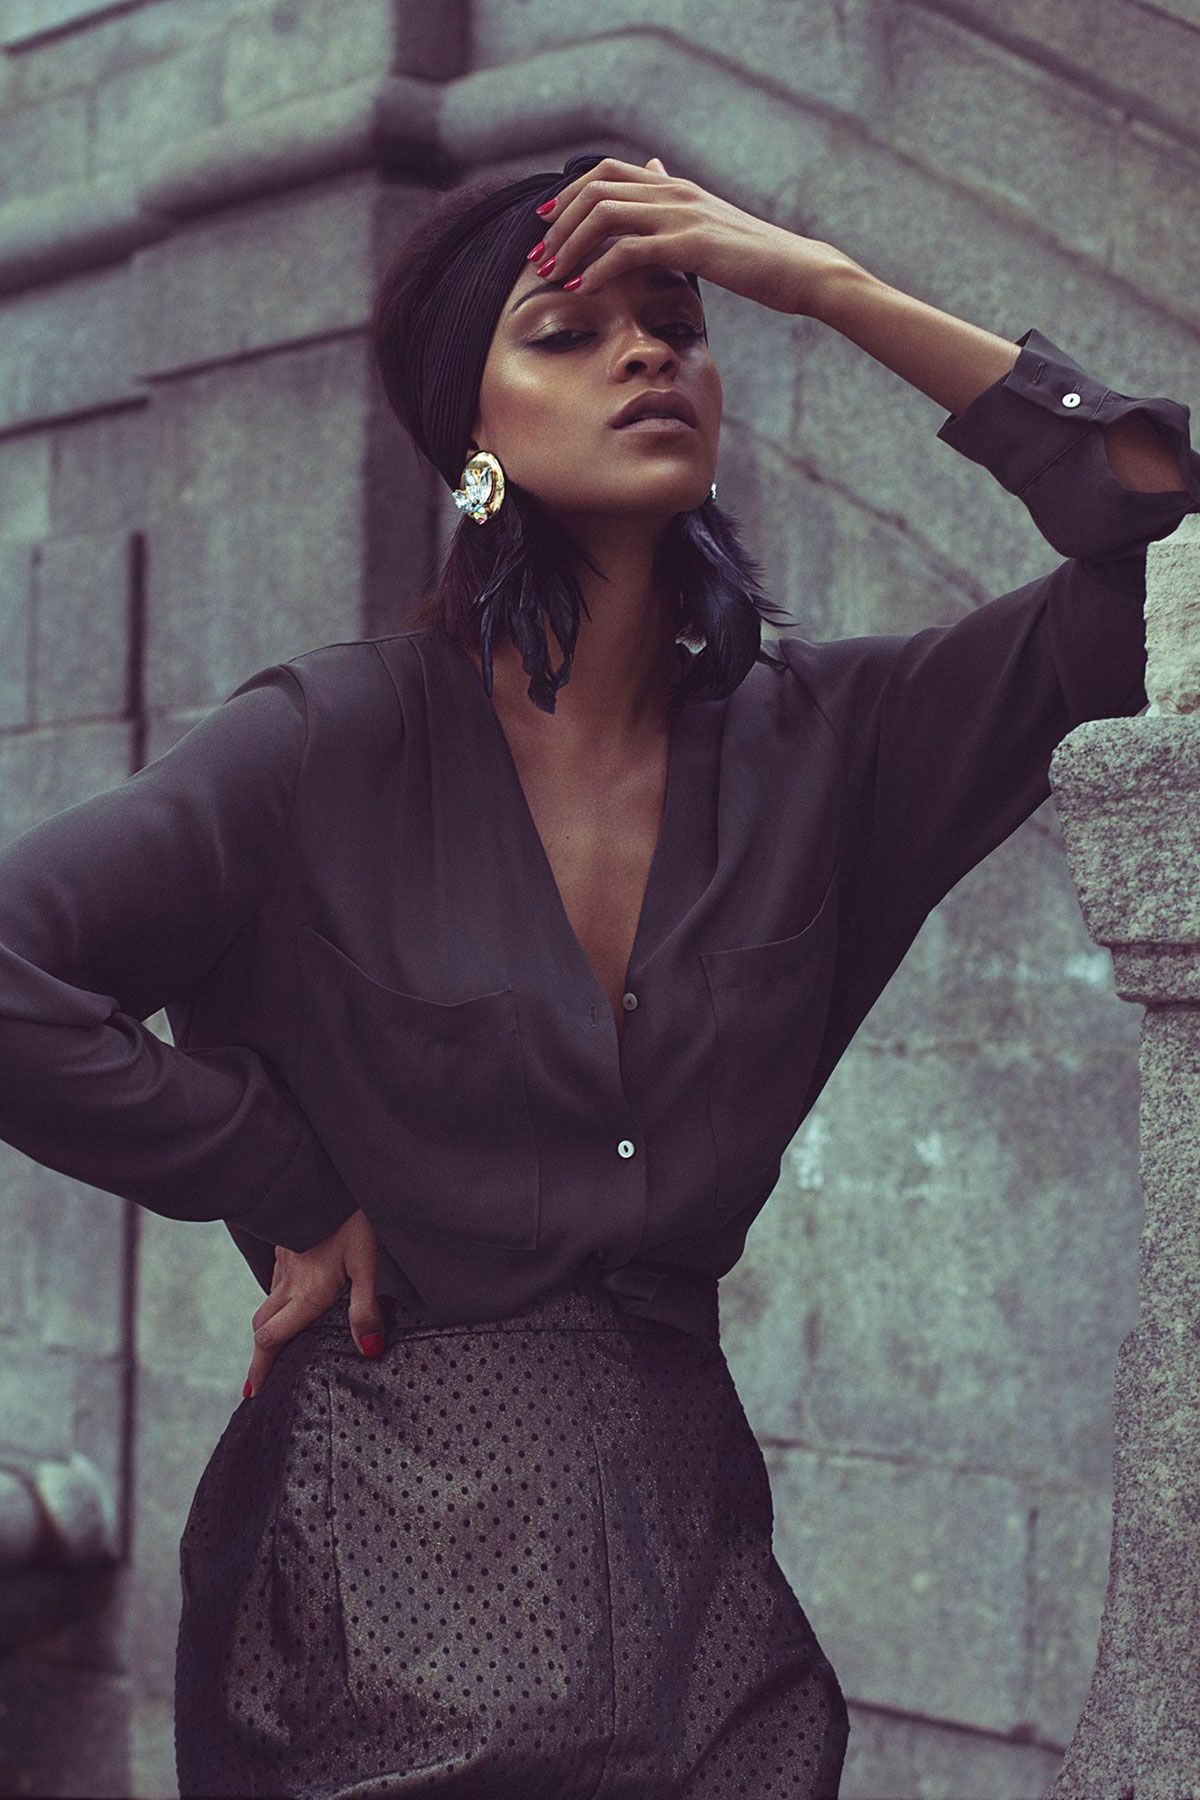 Fashion Editorial URBAN AMAZON by #MayteLuengo on Behance